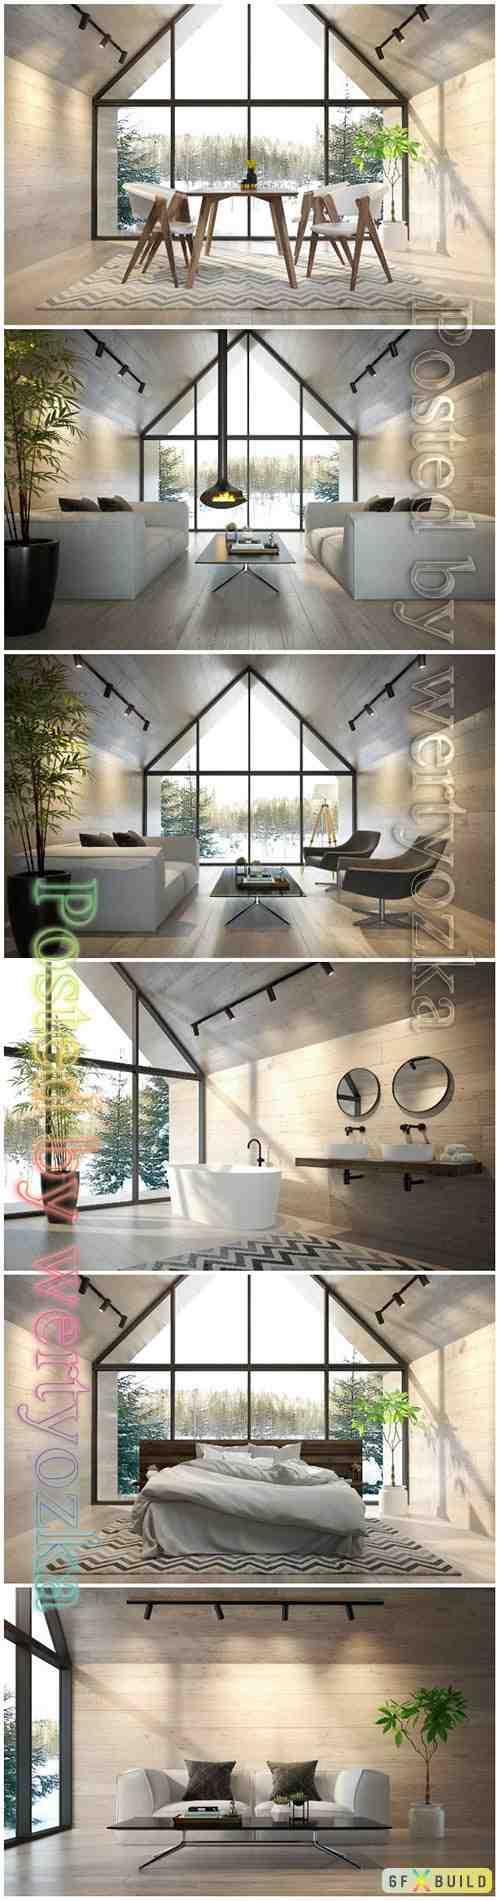 Interior living room beautiful stock photo